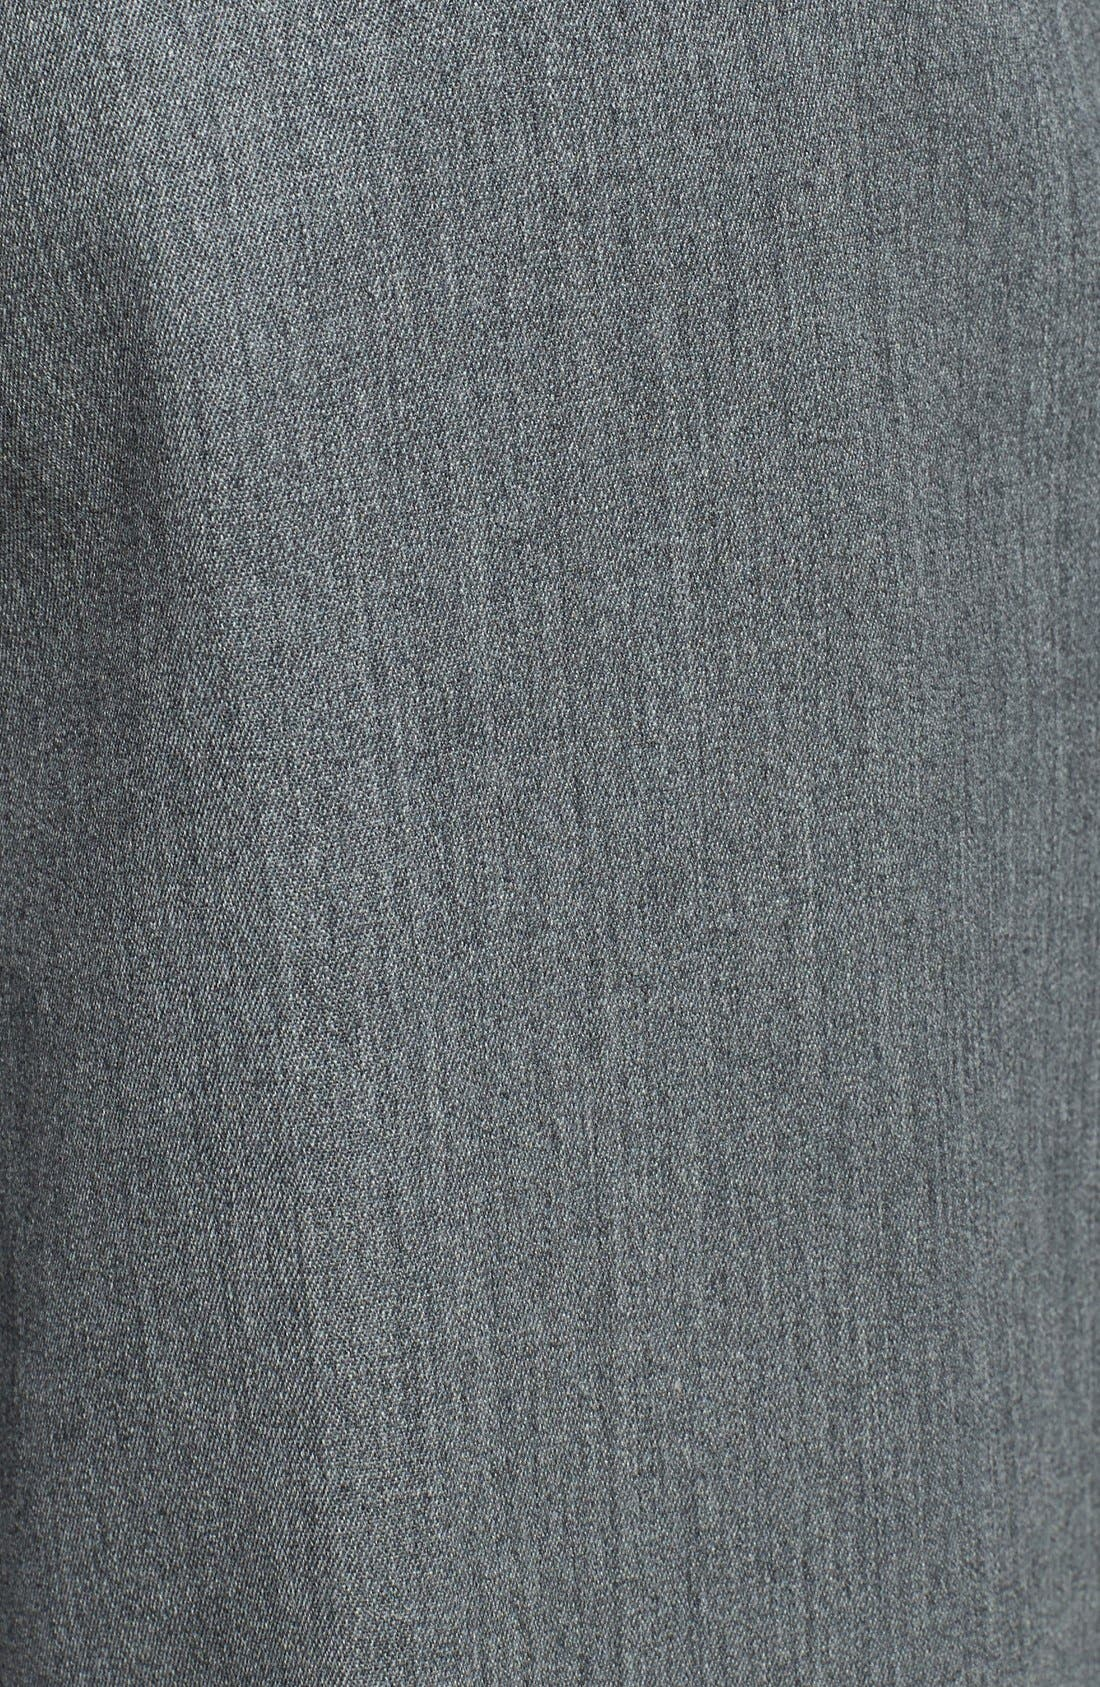 Self Sizer Waist Pleated Wool Gabardine Trousers,                             Alternate thumbnail 6, color,                             MEDIUM GREY